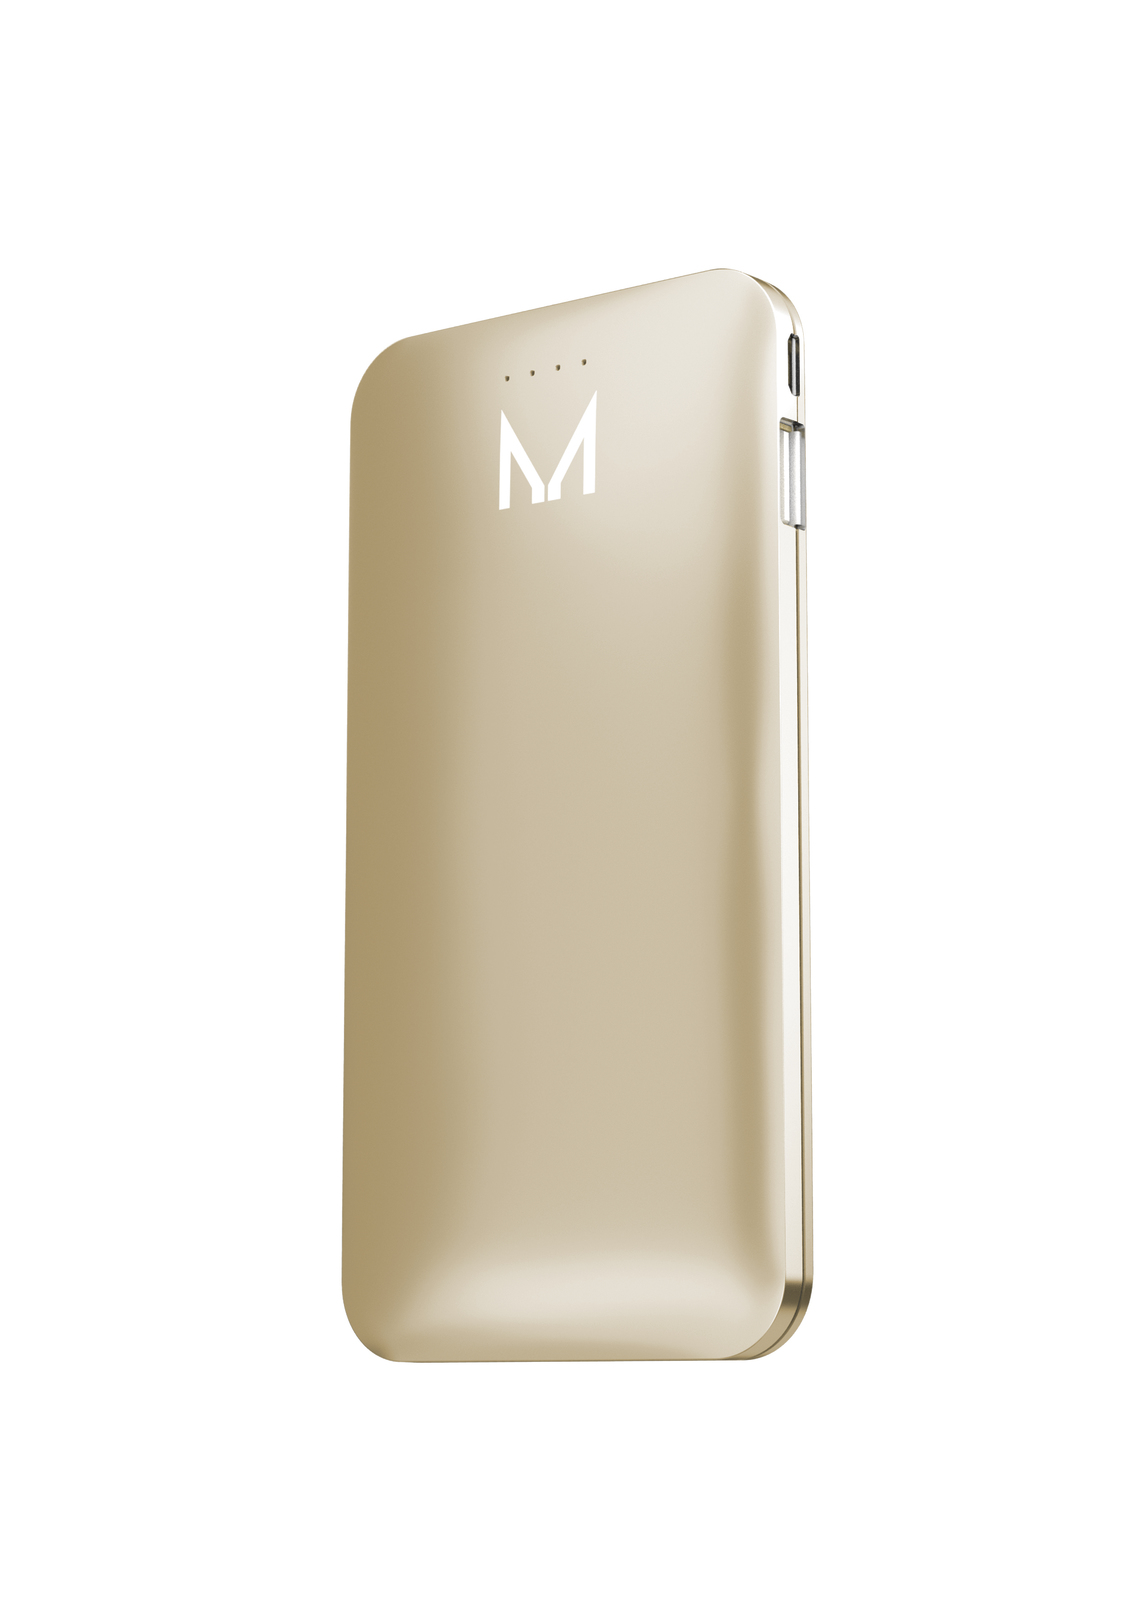 Moyork LUMO 5000 mAh Power Bank - Dubai Gold image